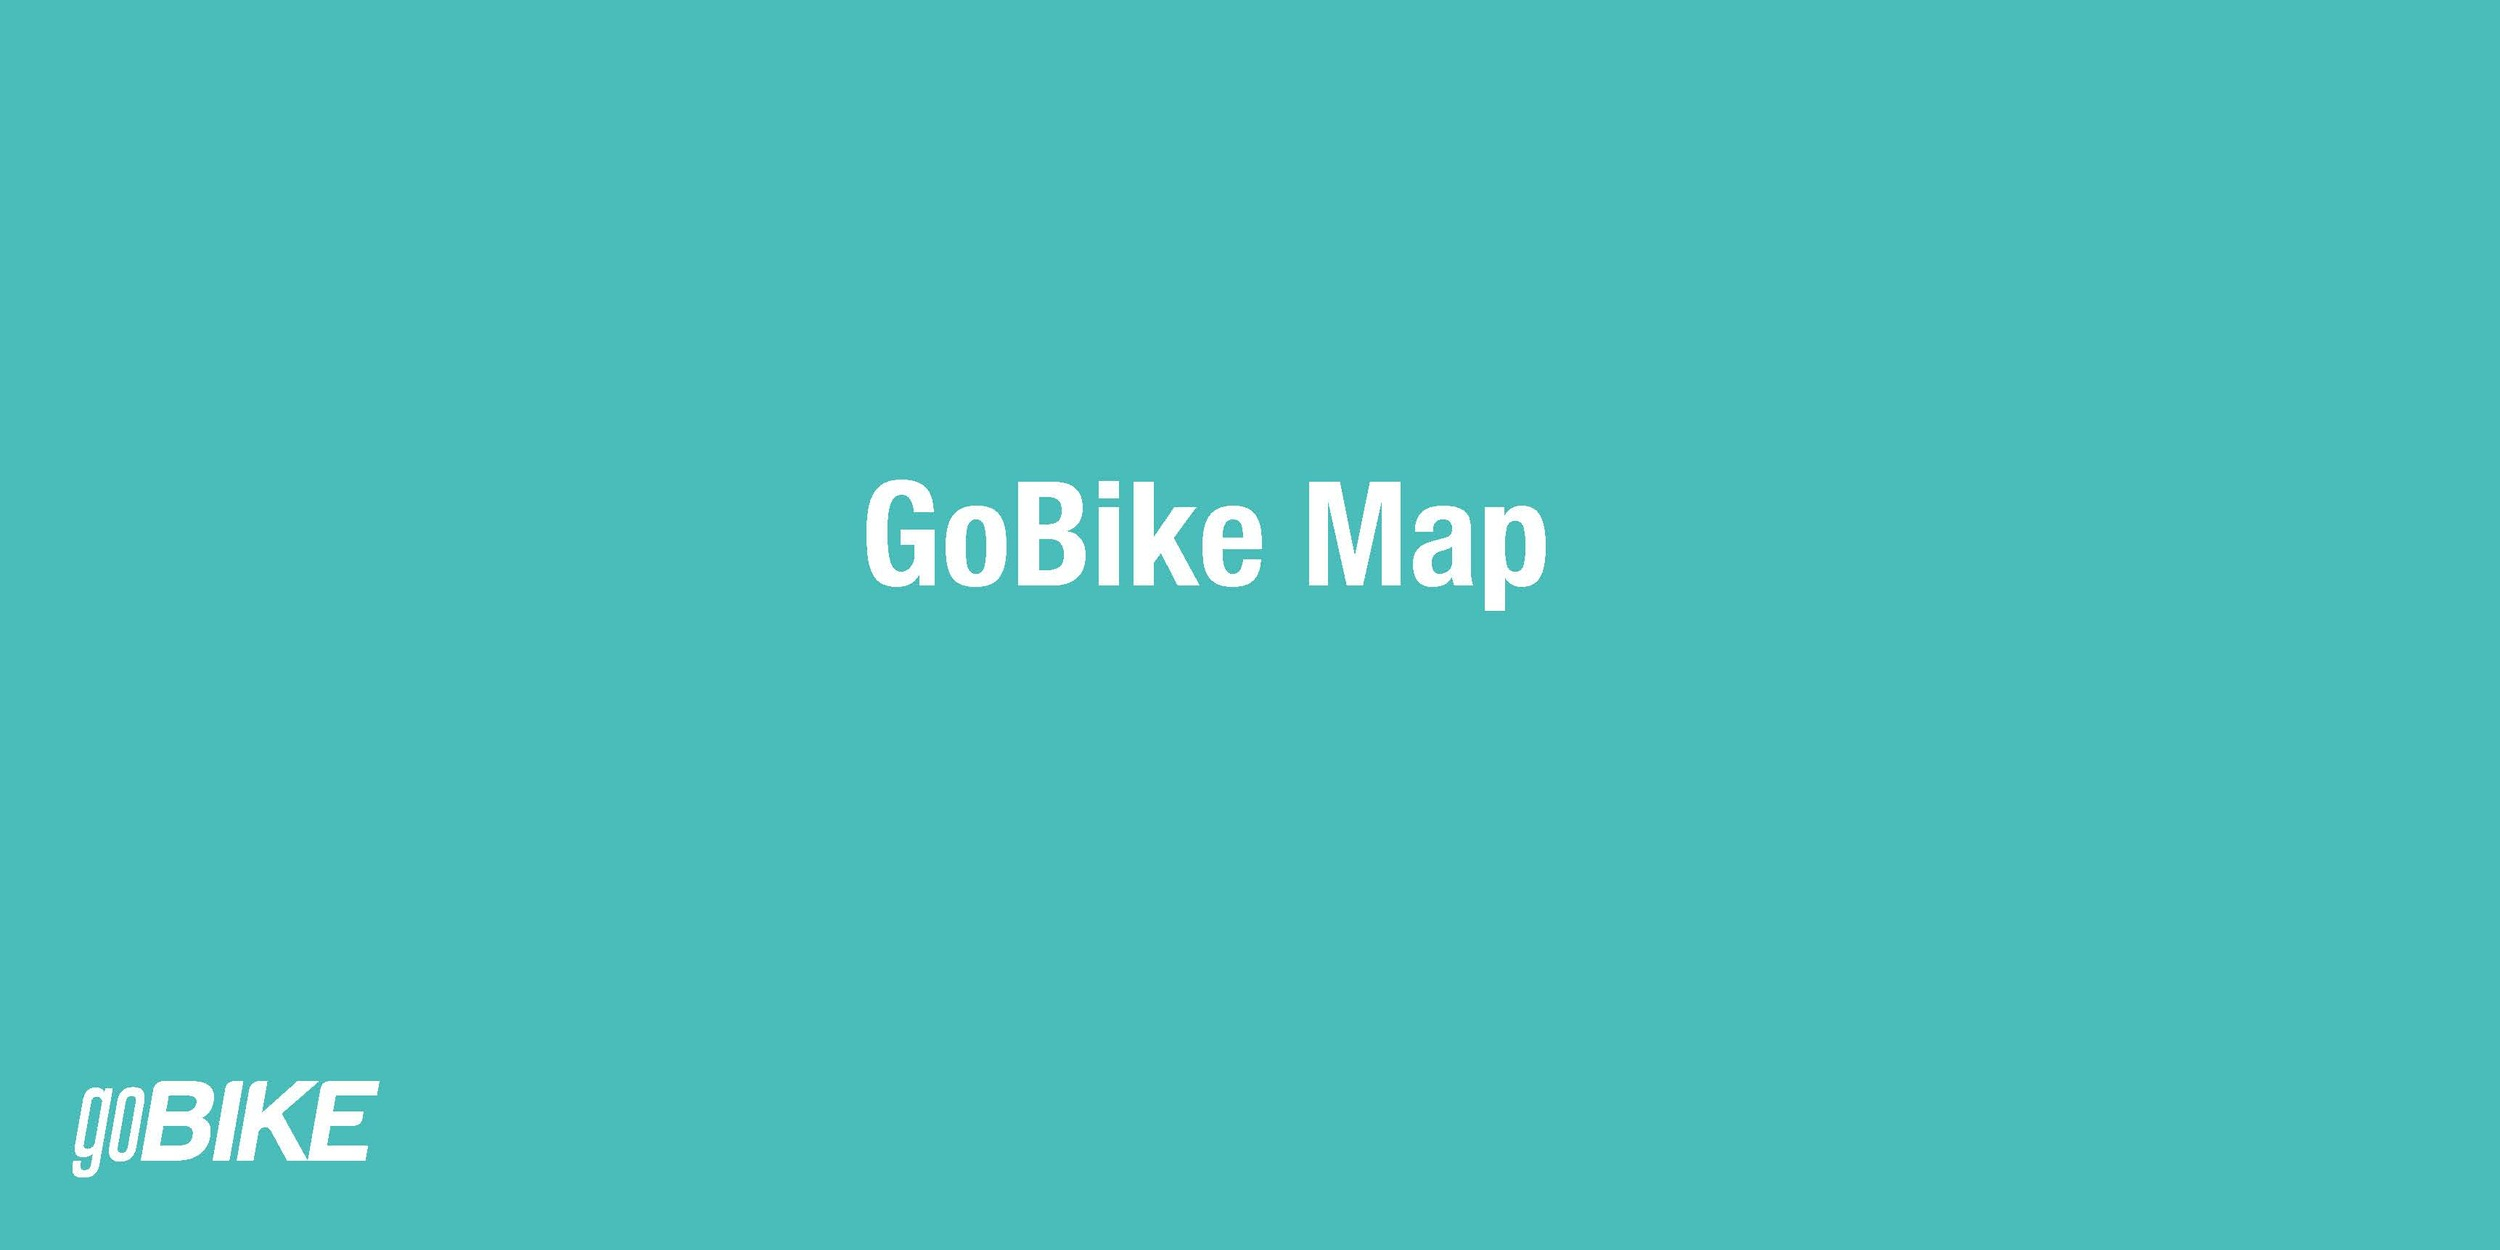 6_gobike_cc4_Page_26.jpg